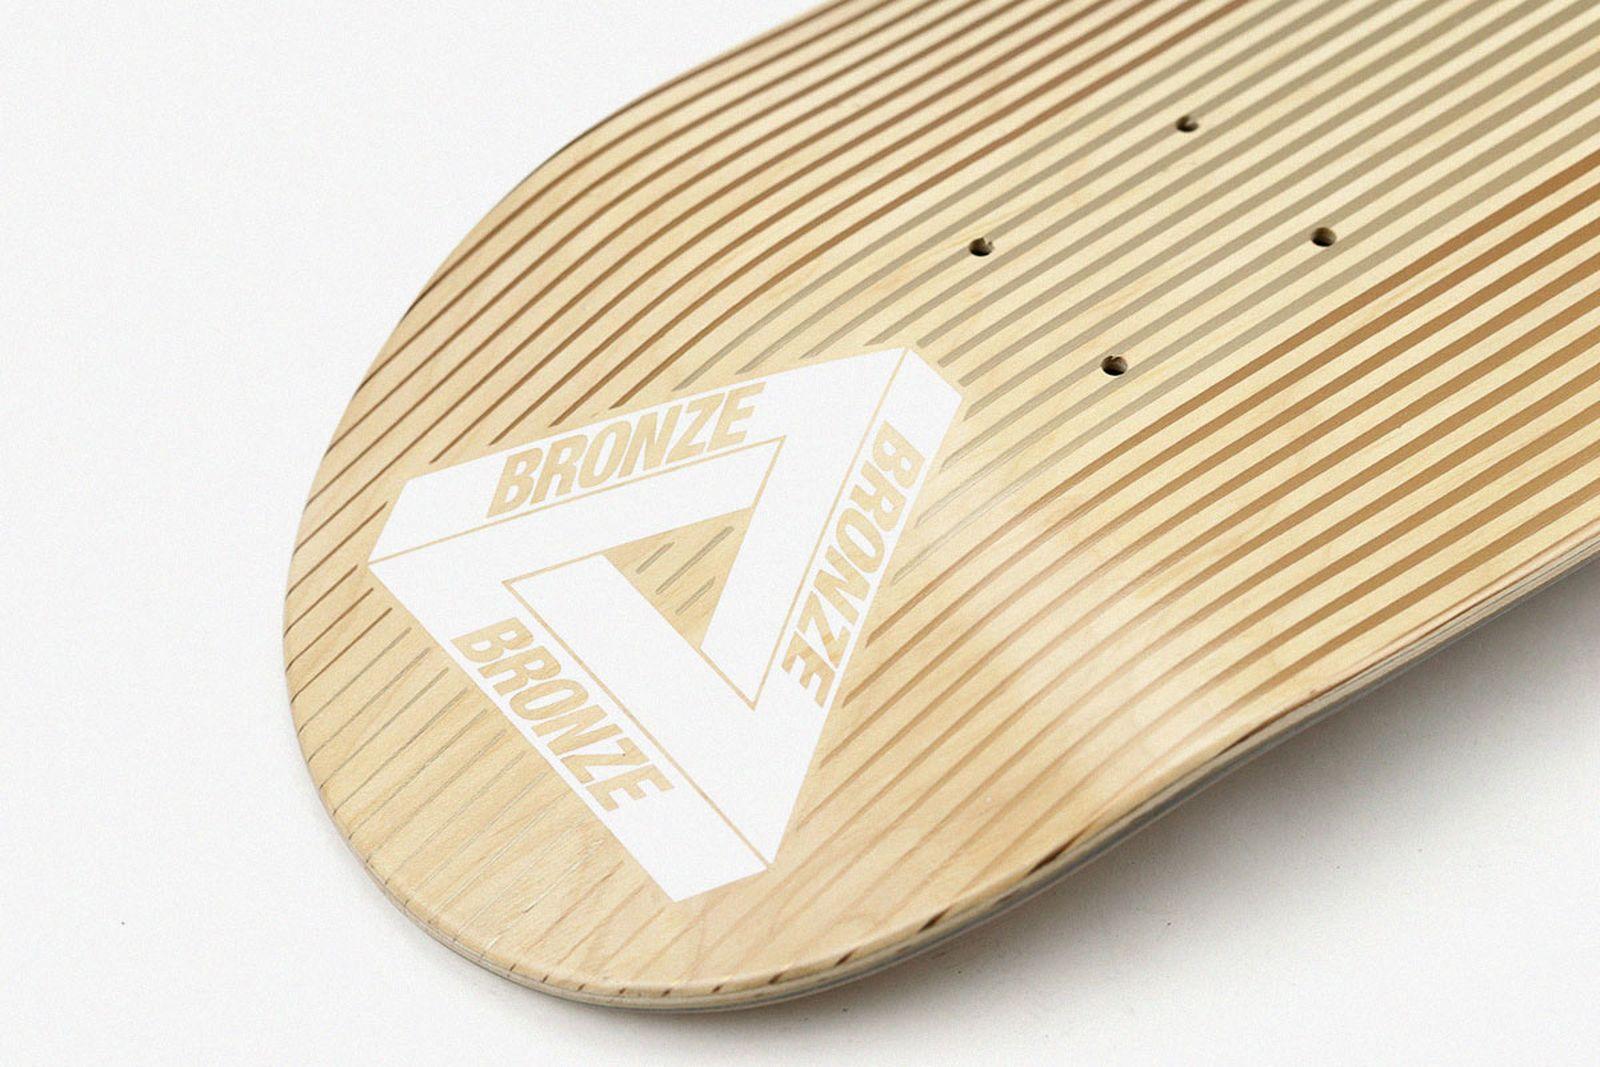 palace-skateboards-guide-18